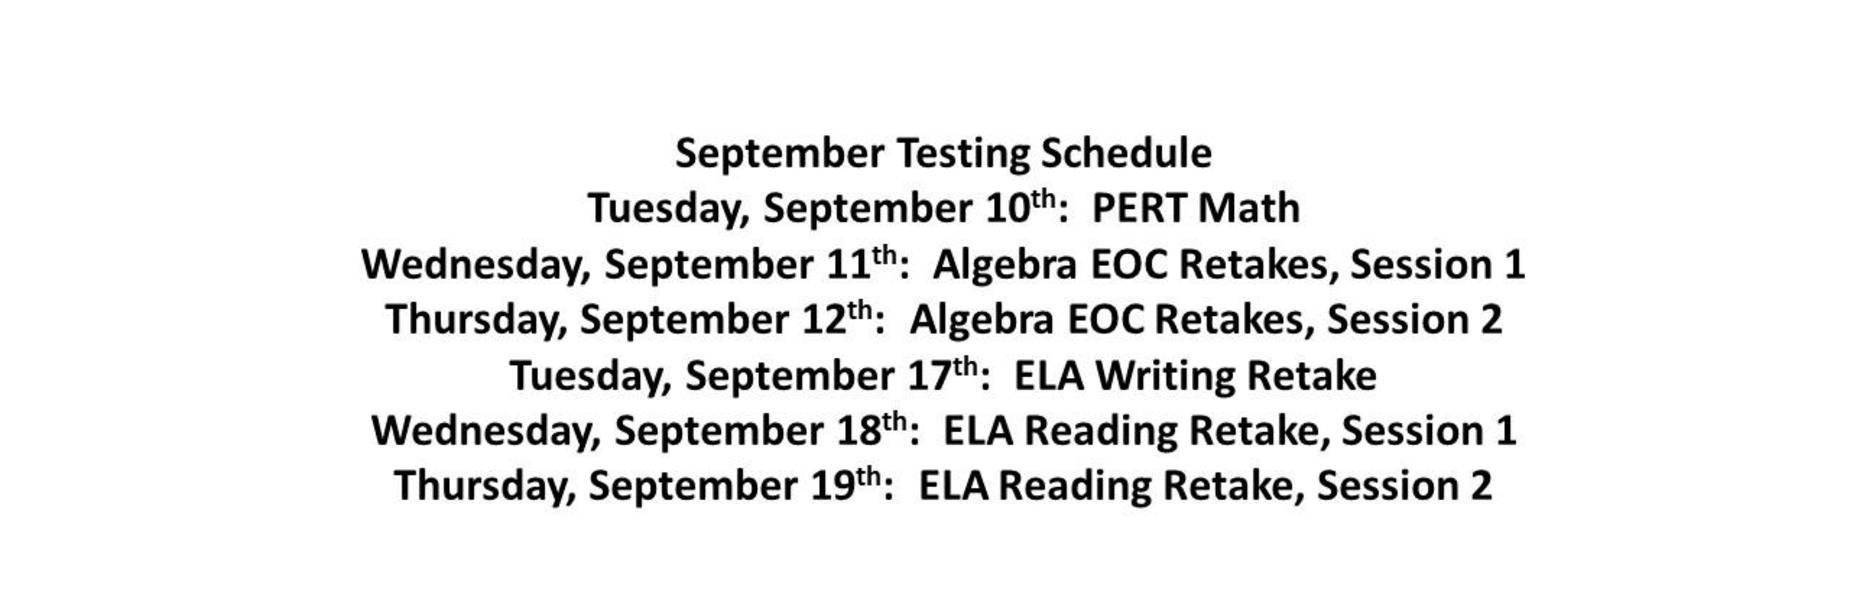 September Testing Schedule